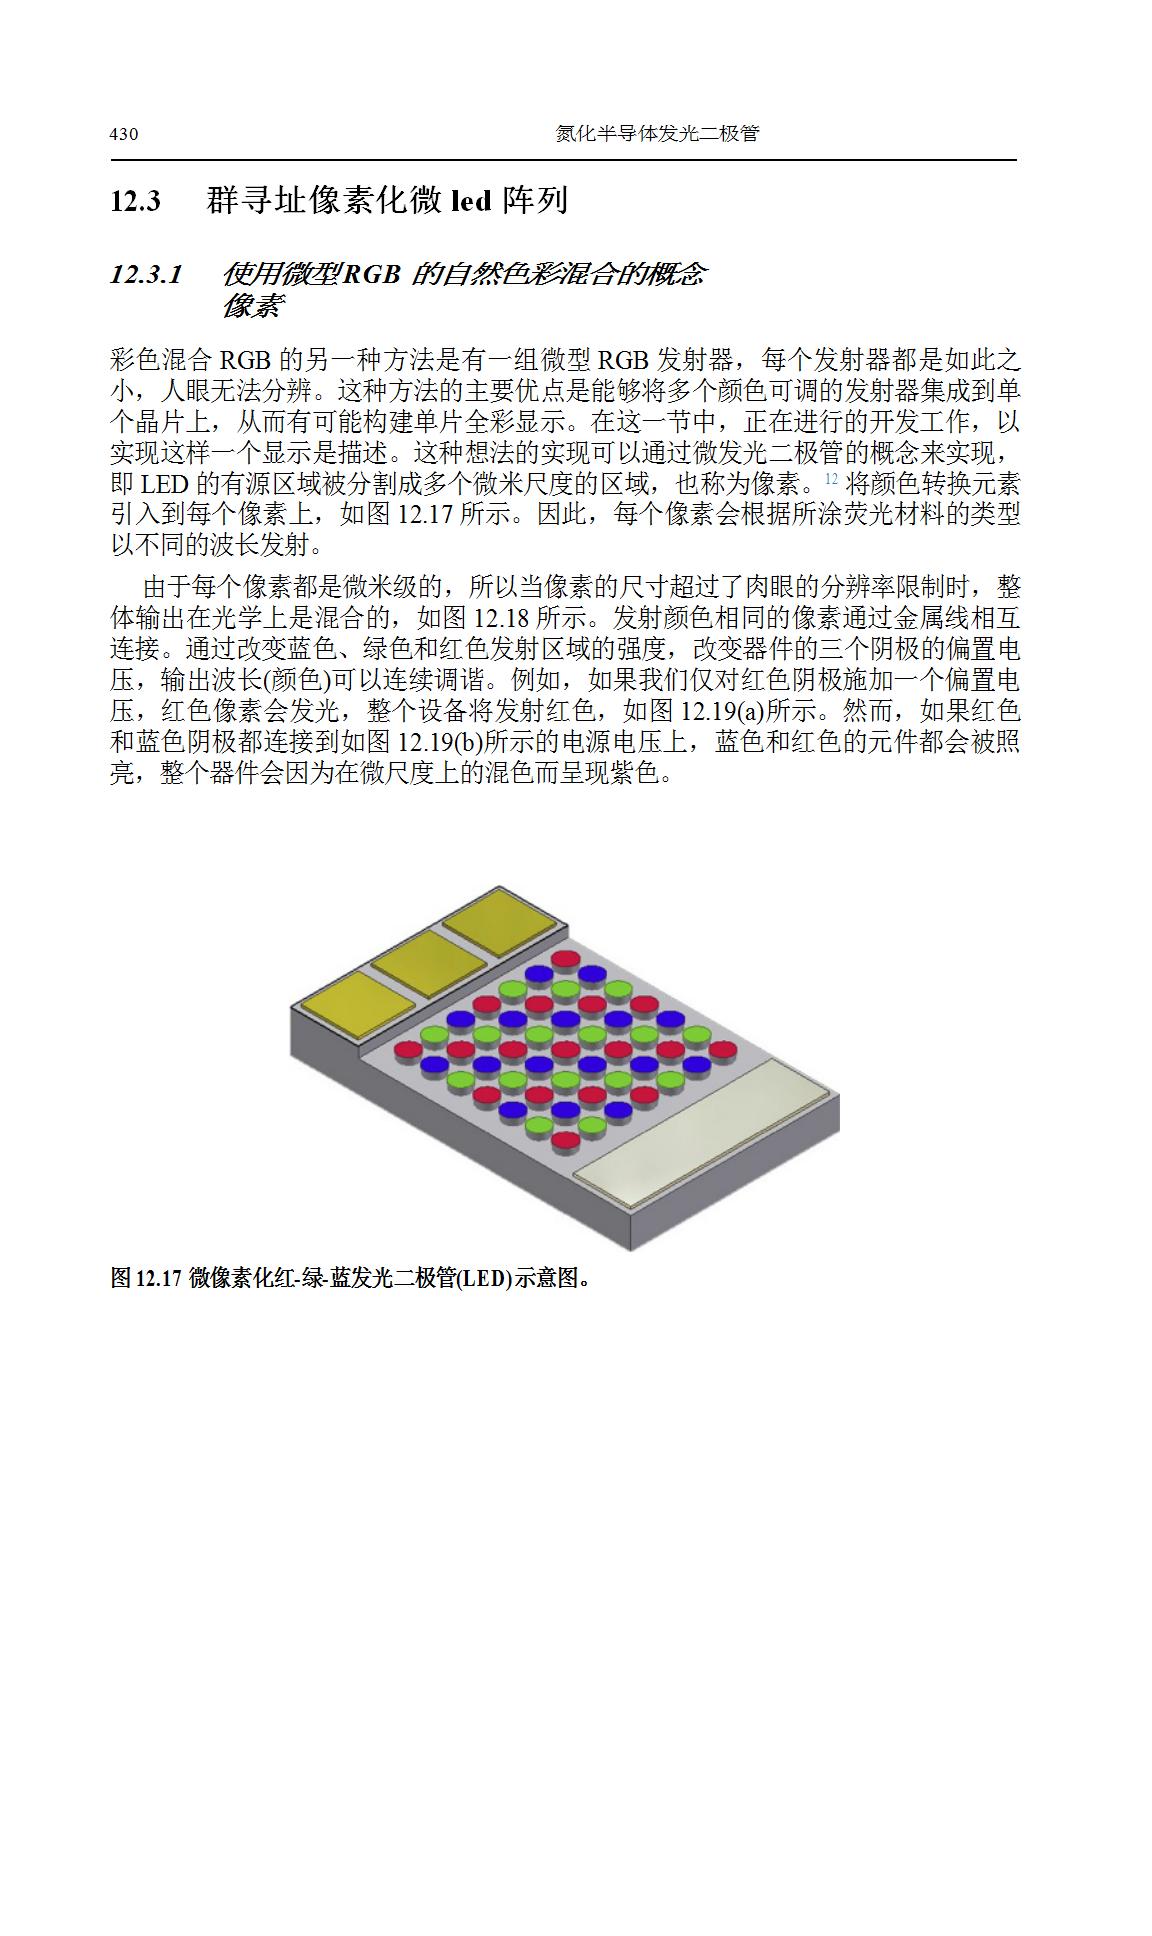 LED调色和像素化MicroLED阵列研究  第16张